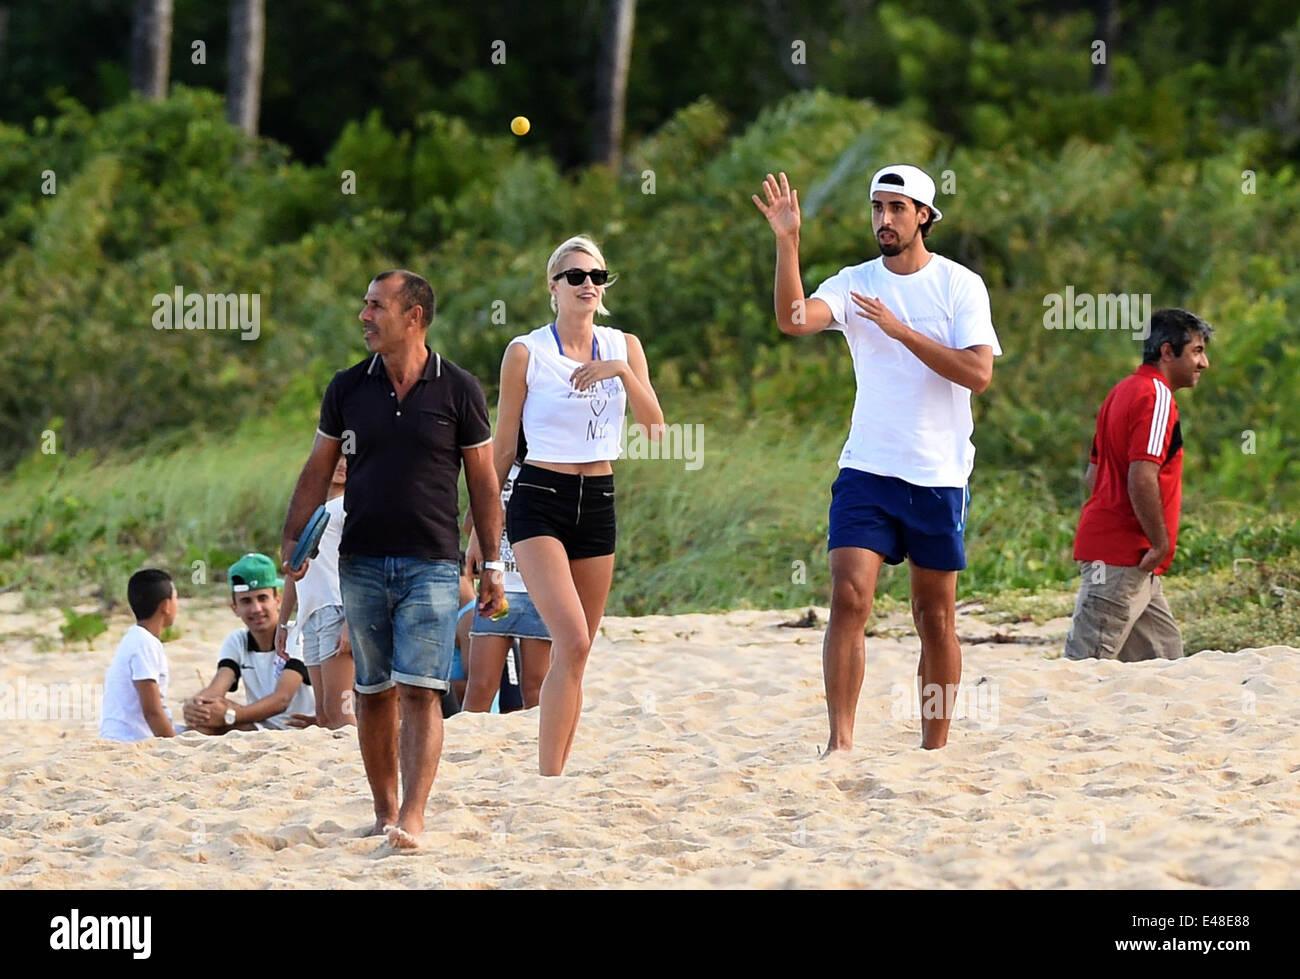 Sami Khedira 2 R Of The German National Soccer Team And